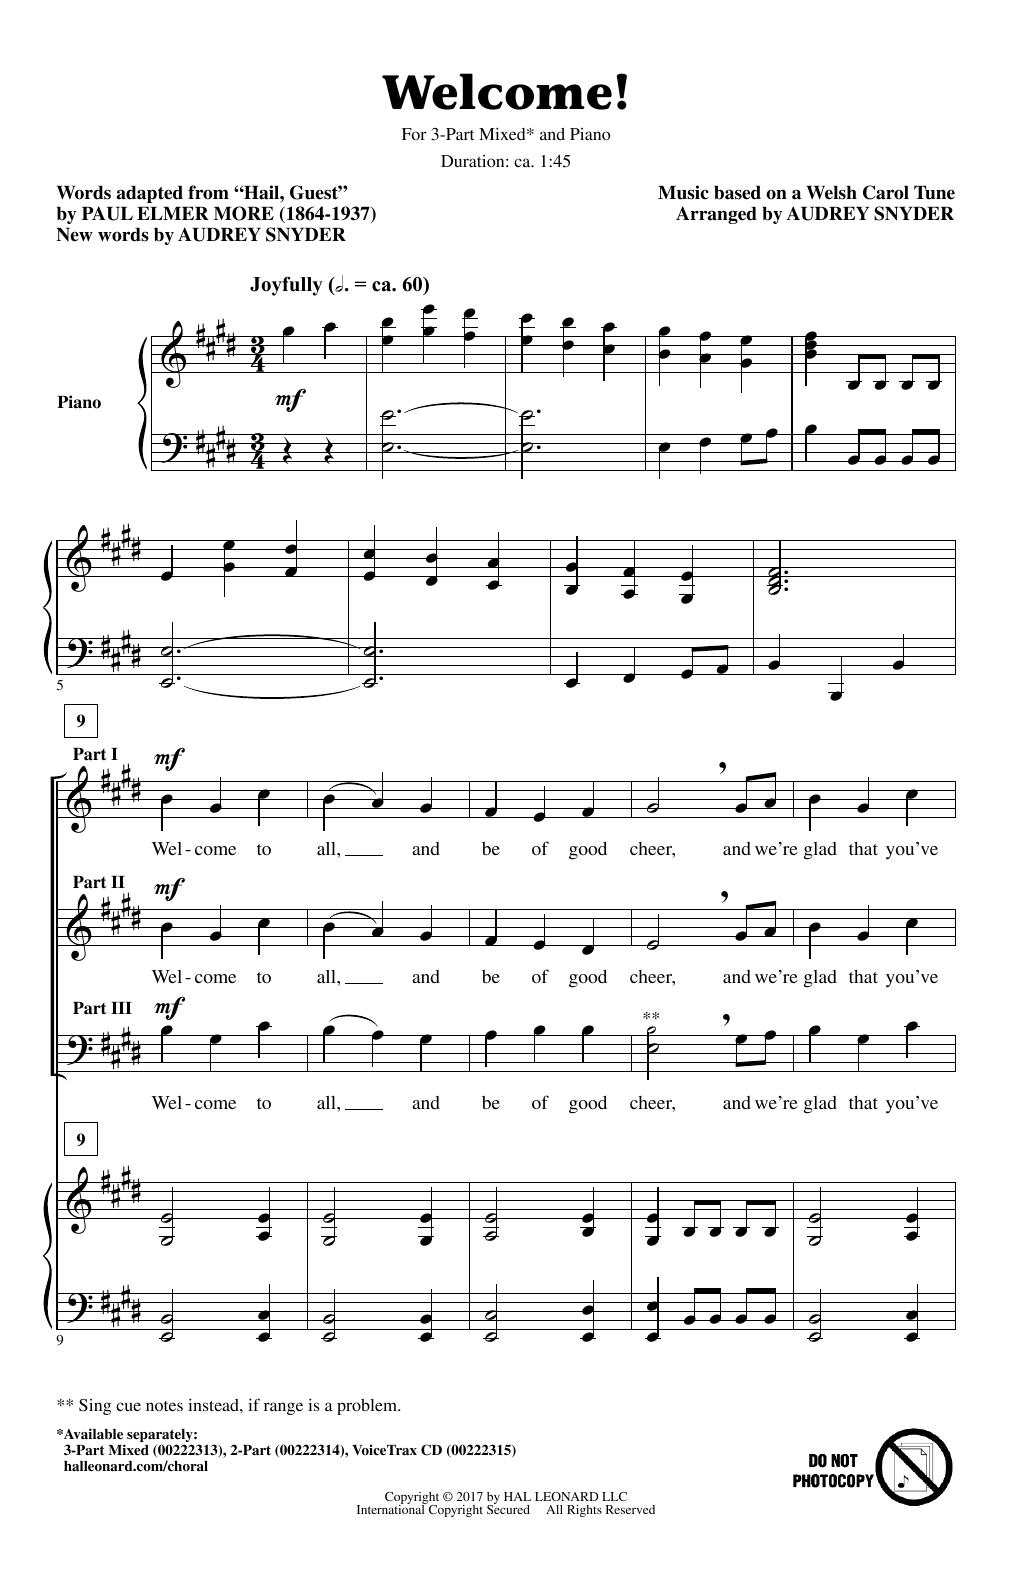 Welcome! Sheet Music